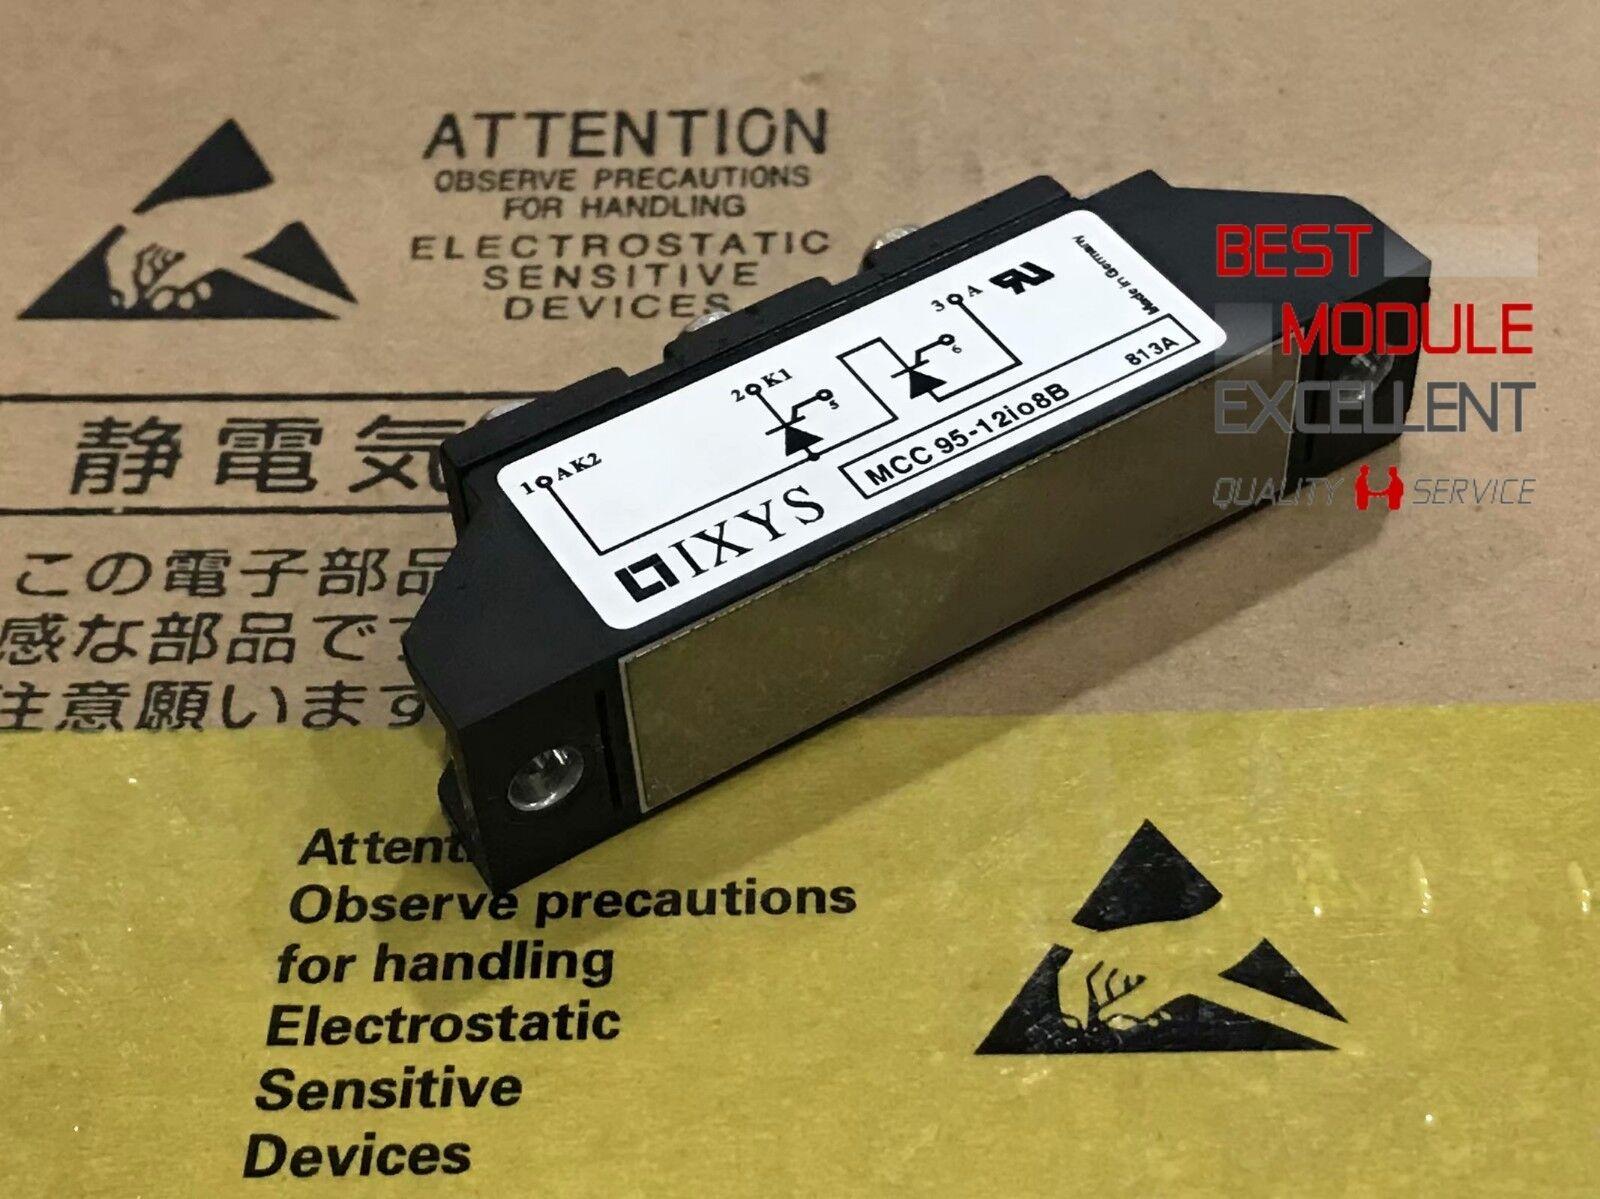 1PCS MCC95-12IO8B New Best Offer Best Price Quality Assurance MCC95-12I08B